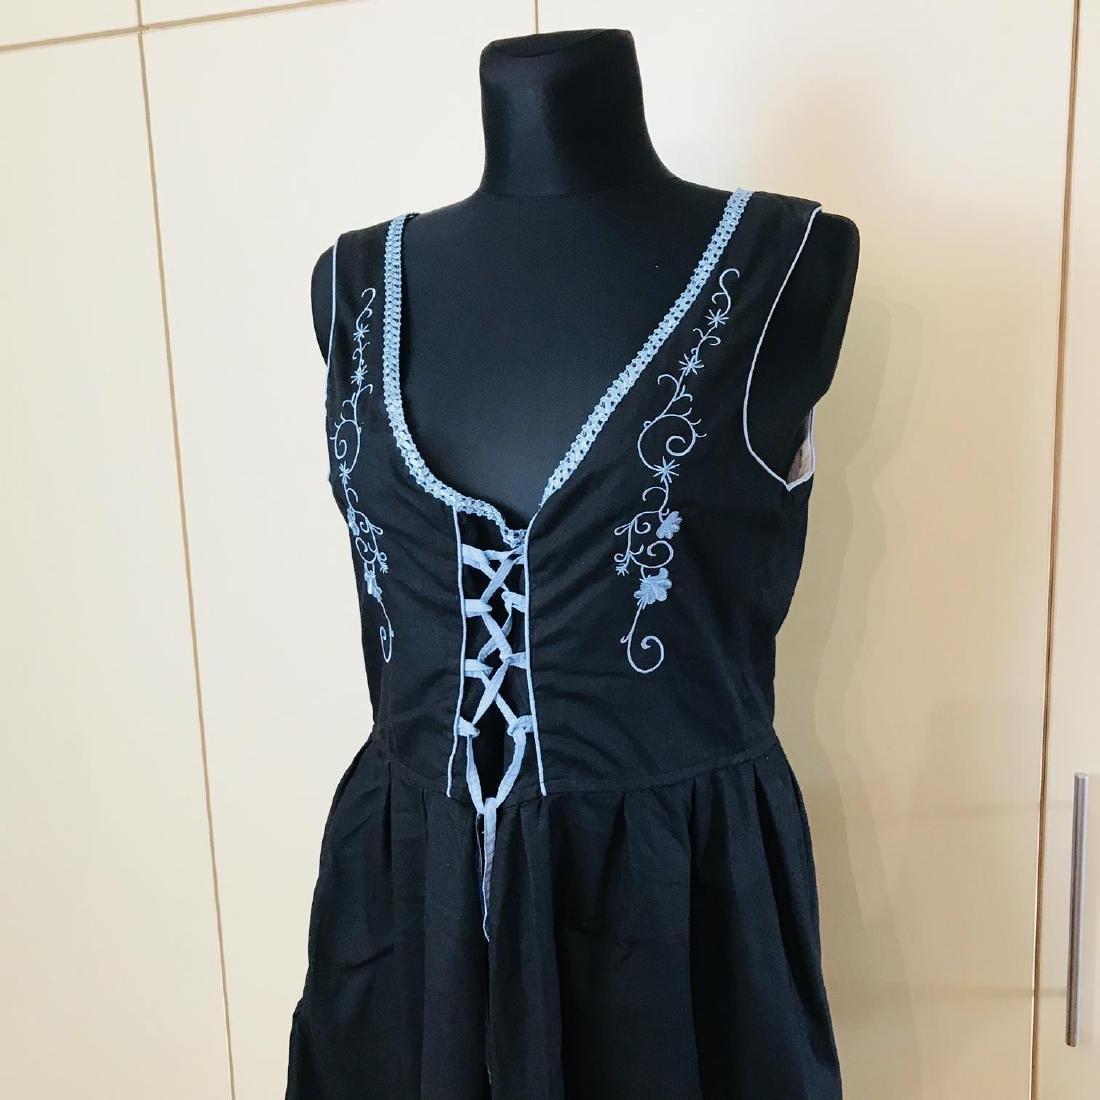 Vintage Women's Black Tyrolean Drindl Dress Size US 16 - 2